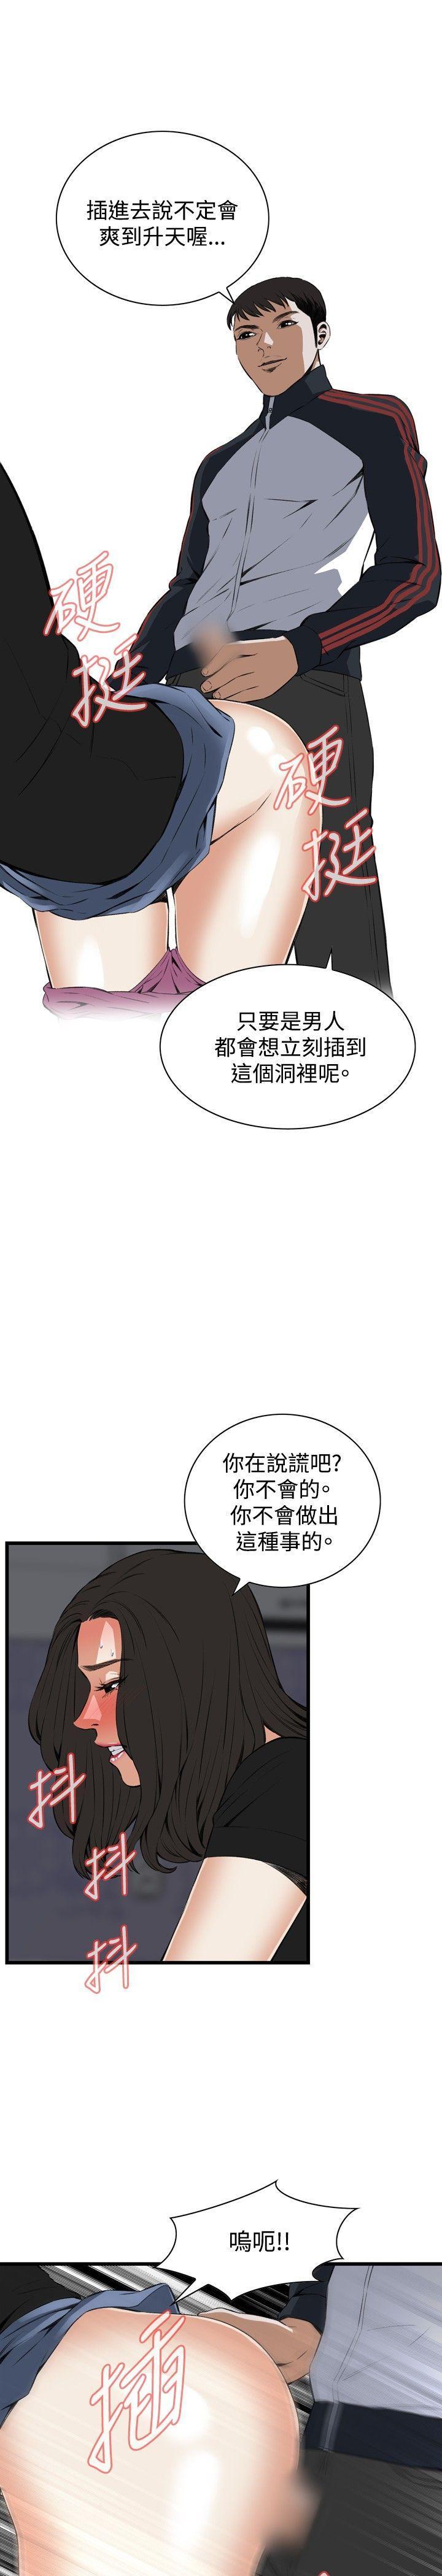 Take a Peek 偷窥 Ch.39~60 [Chinese]中文 577